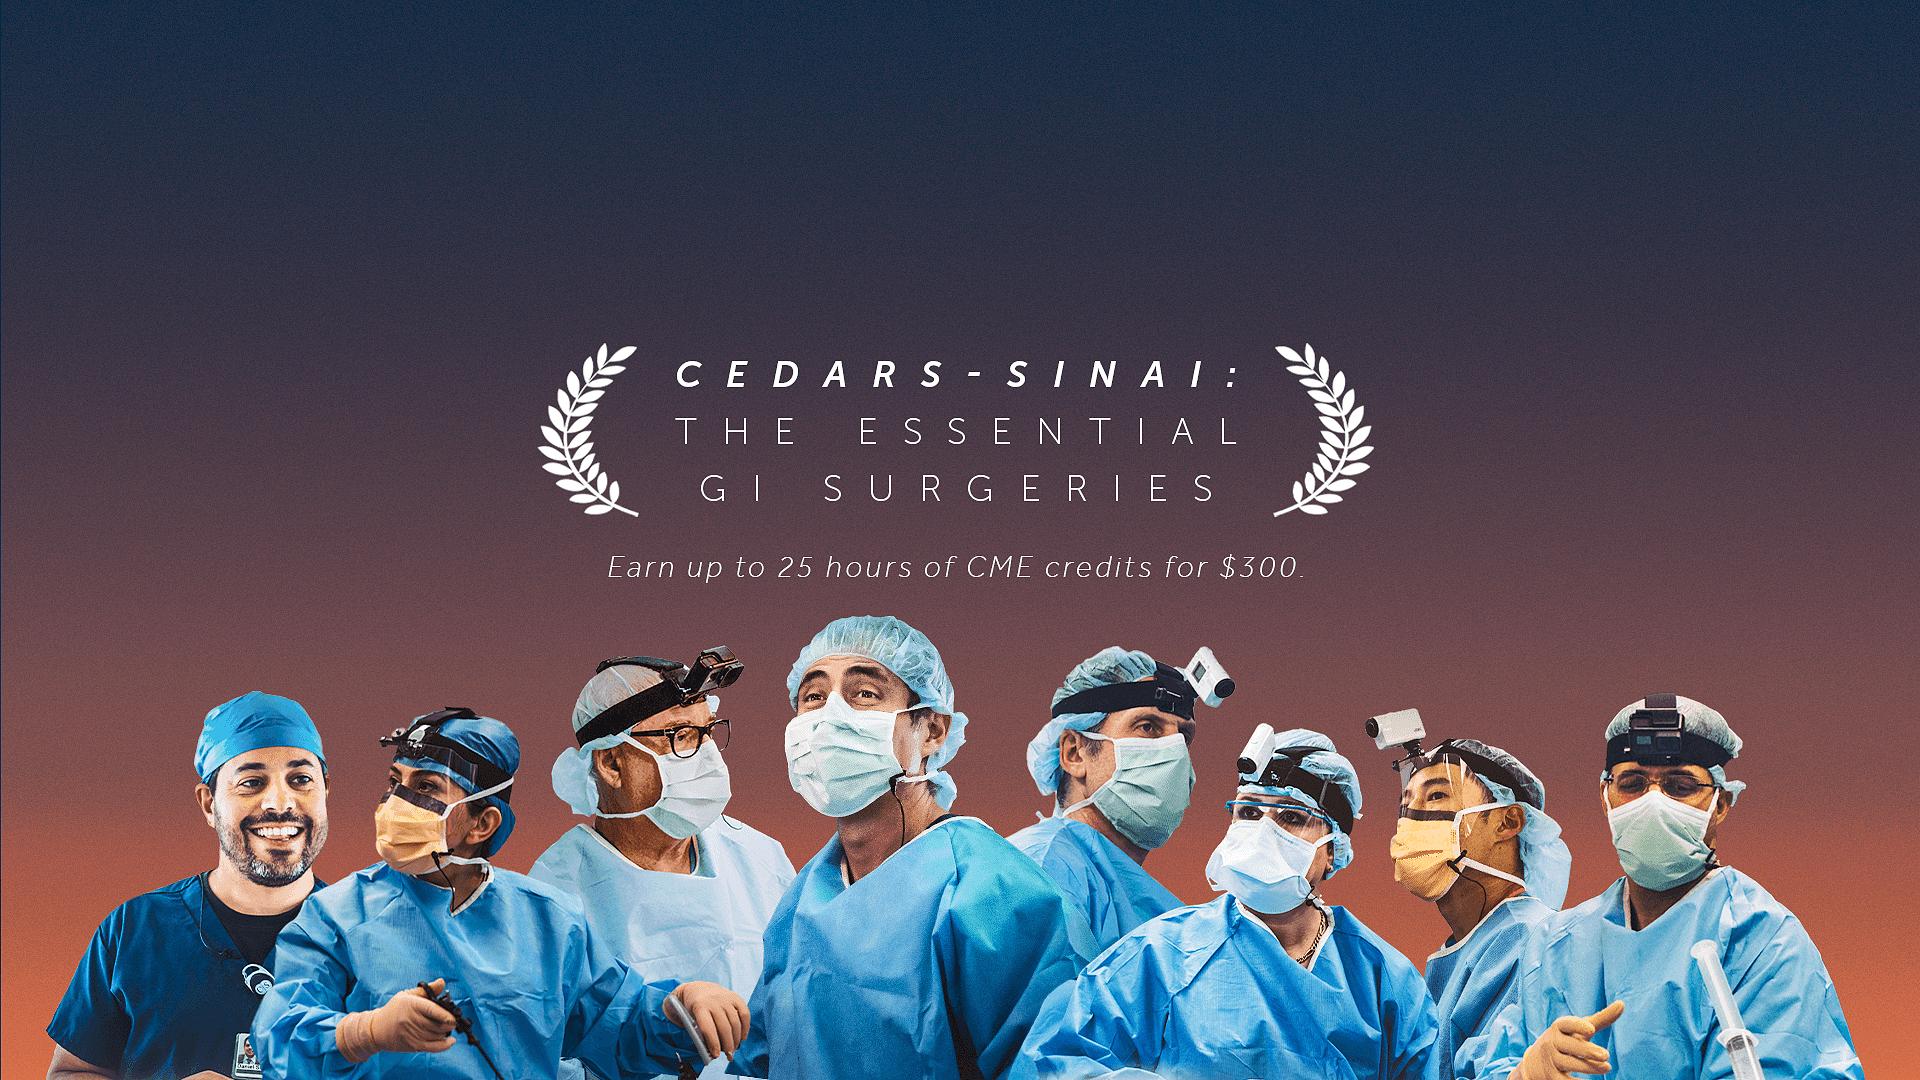 Cedars-Sinai Promo Video | GIBLIB